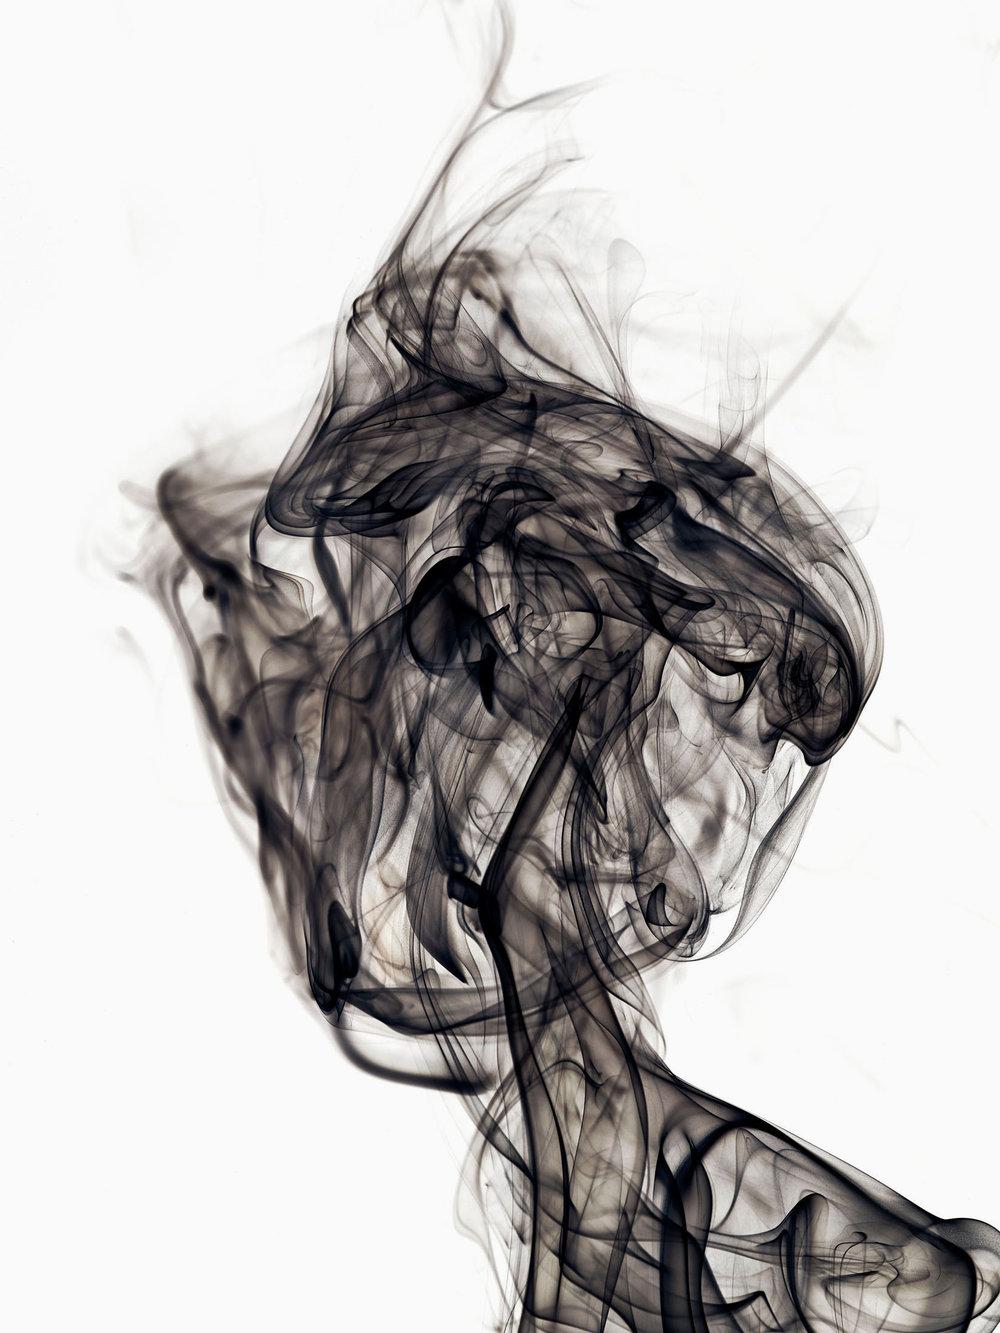 Shai Kremer,  Perception #15 , 2017, Archival pigment print, Edition of 7+2AP, 40x30 inches